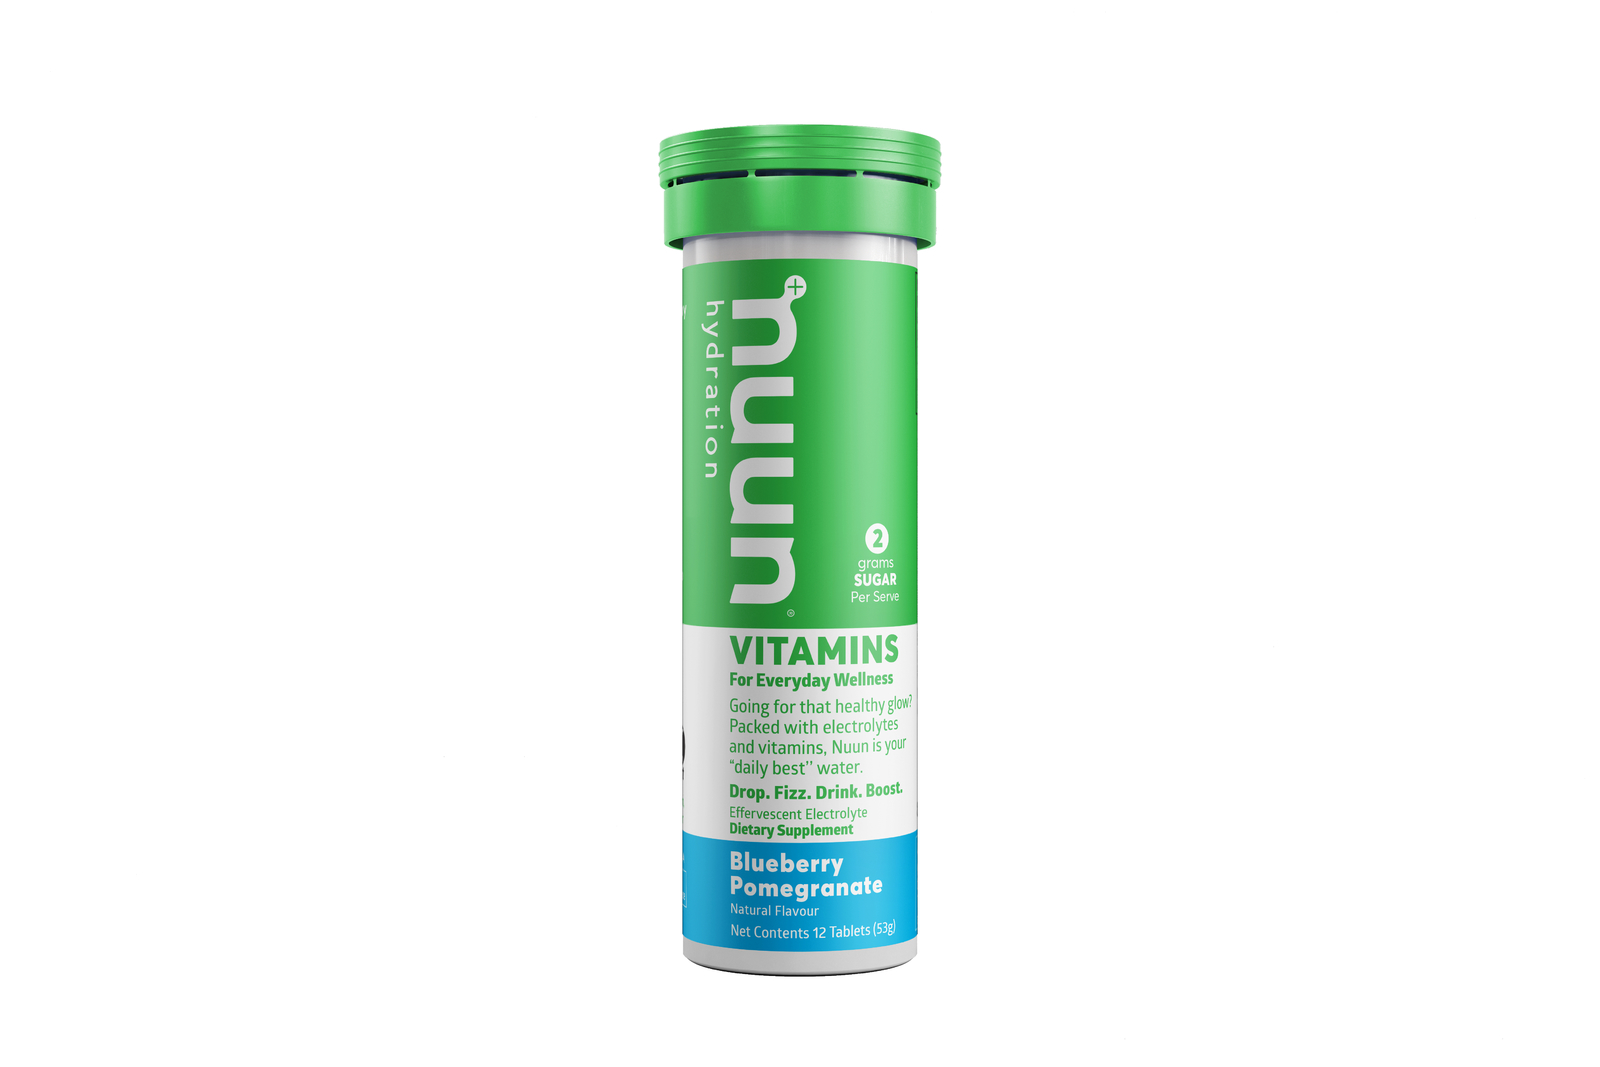 Nuun Vitamin Tablets - Blueberry Pomegranate image